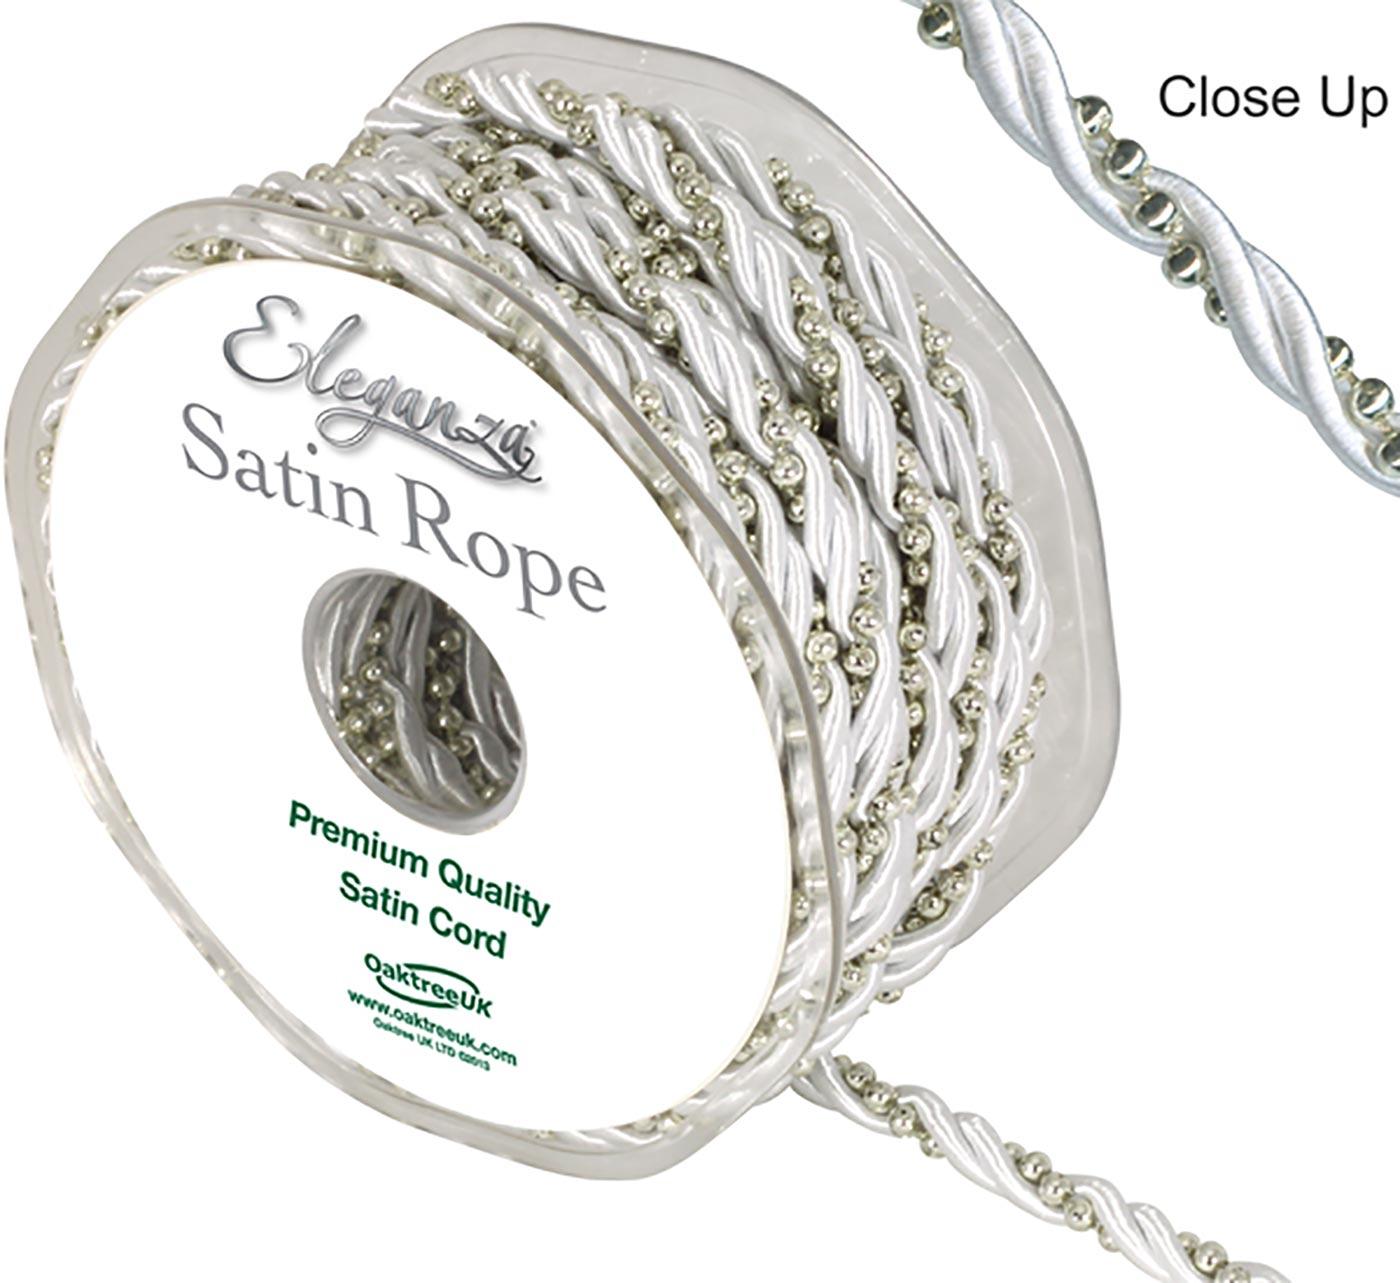 Eleganza Satin Pearl rope 5.5mm x 10m White